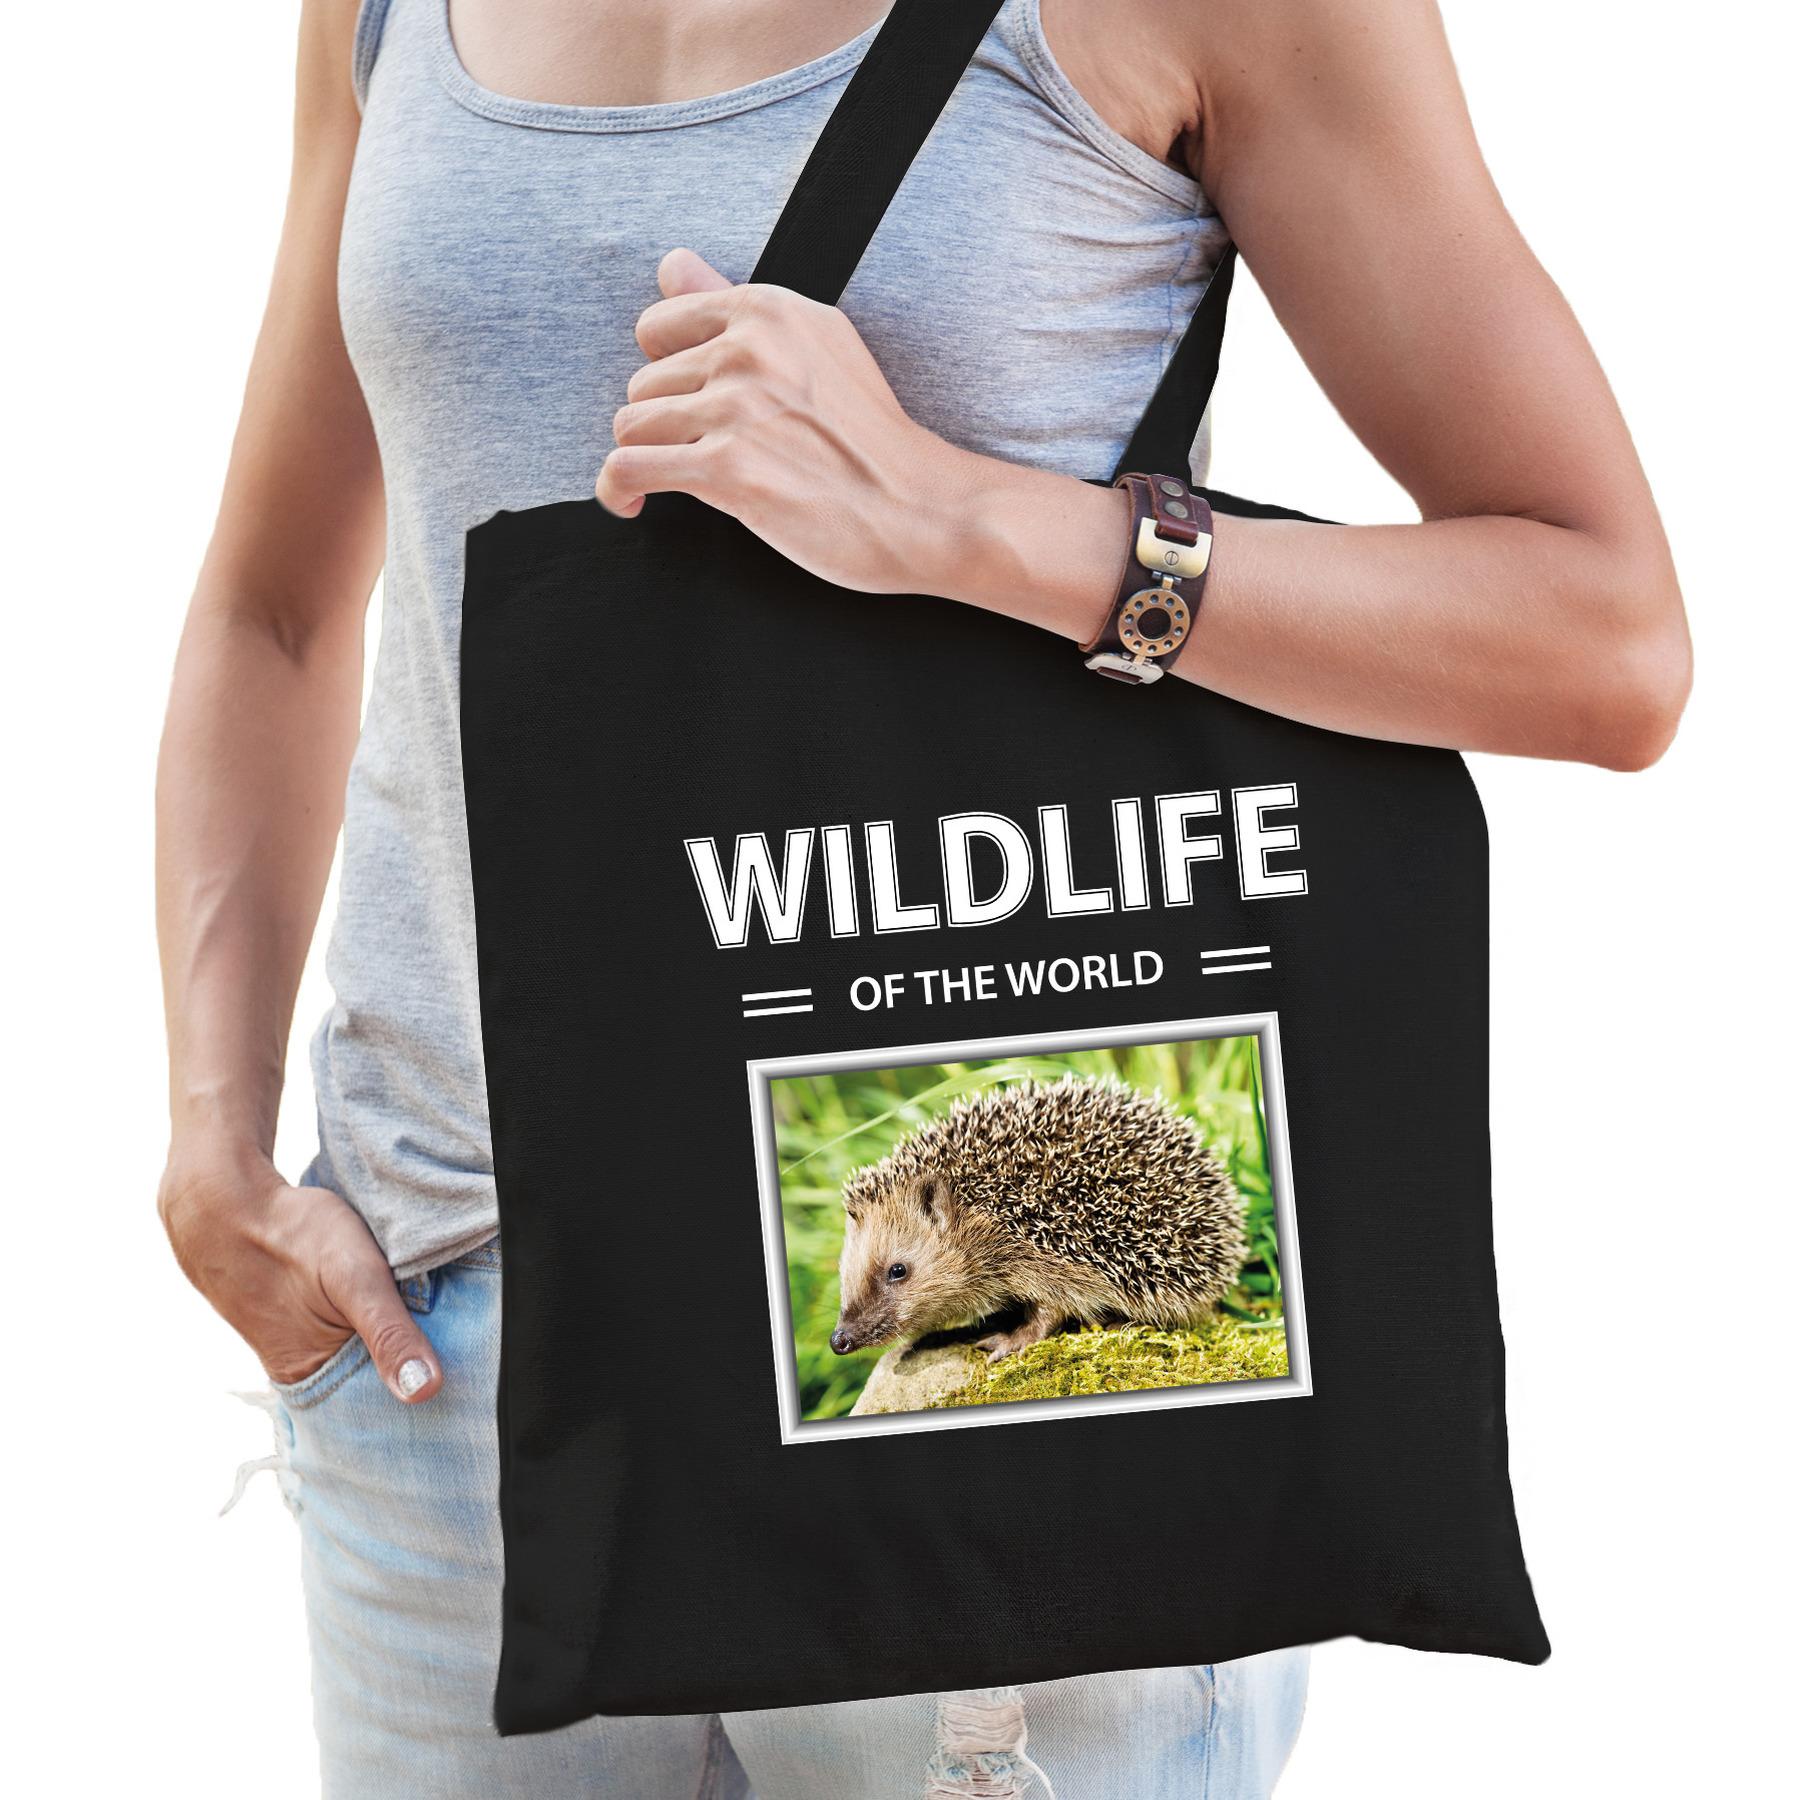 Katoenen tasje Egels zwart - wildlife of the world Egel cadeau tas